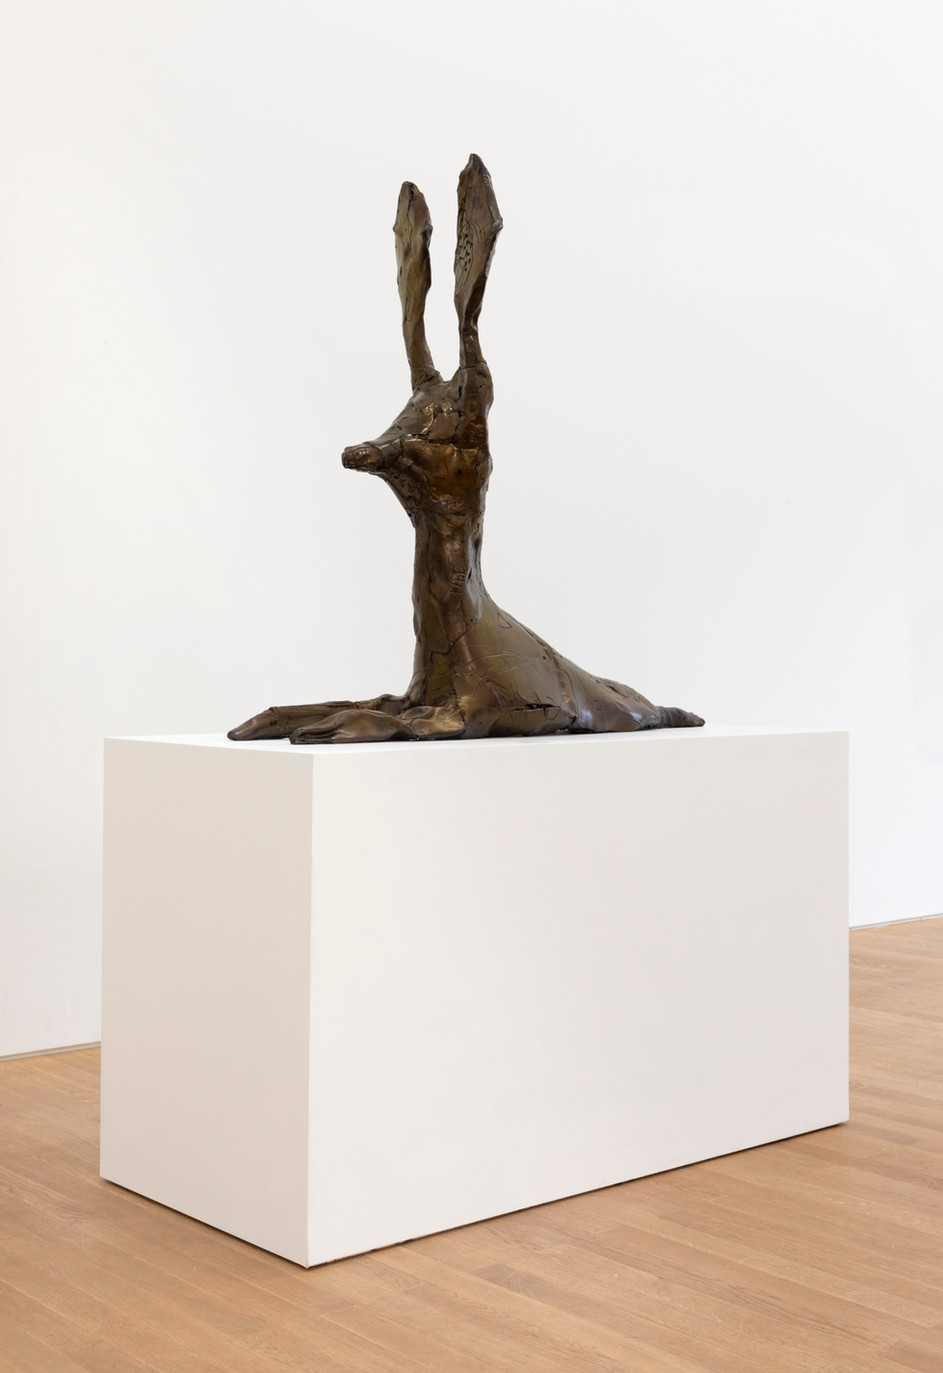 EDWARD LIPSKI Dog-Rabbit 2, 2019 resin, pigment, wood 110 x 45 x 115 cm (sculpture) 164 x 64 x 88 cm (plinth) unique